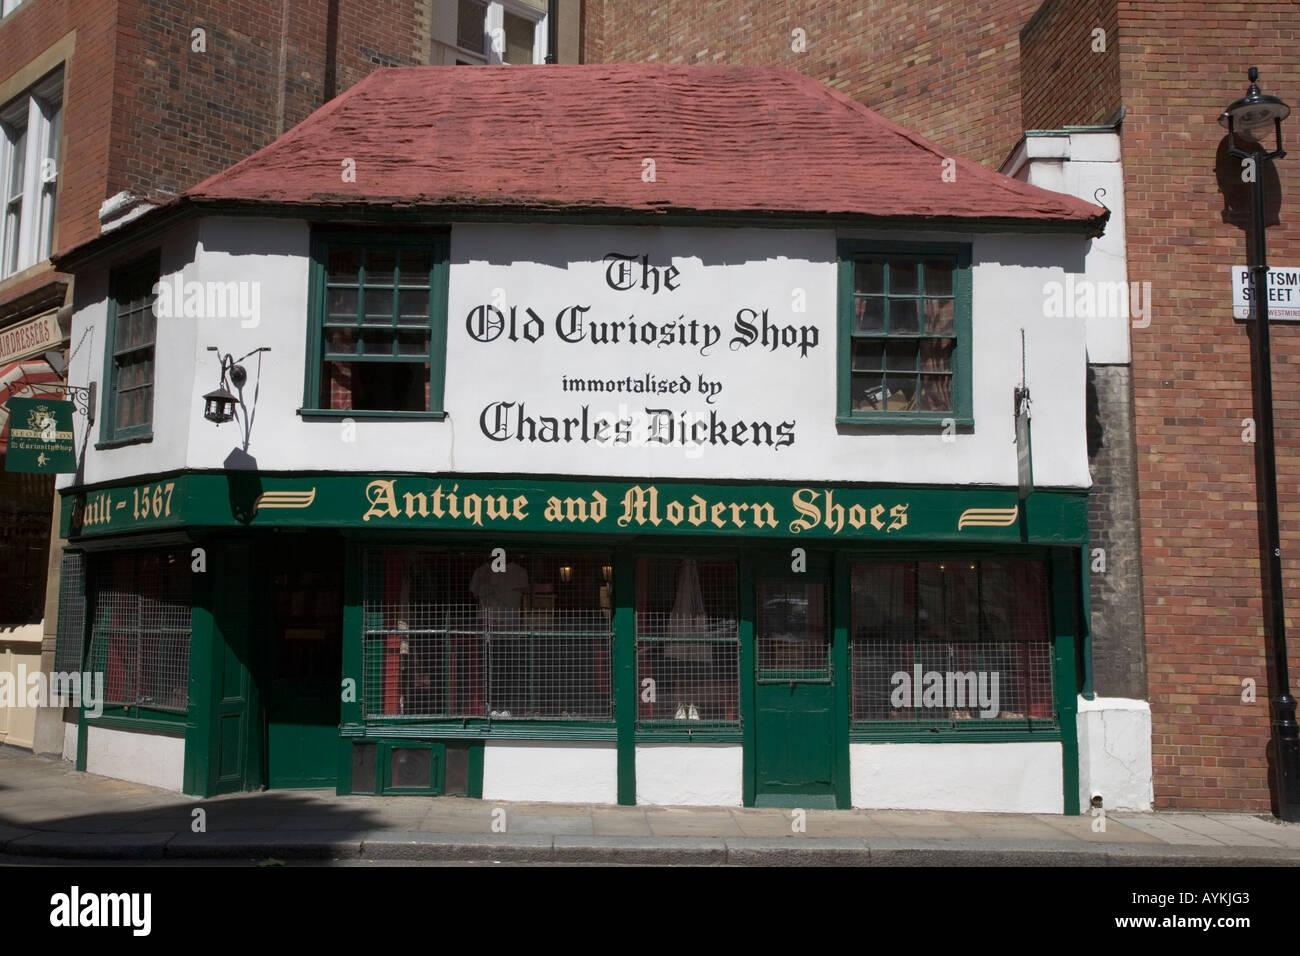 The Old Curiosity Shop Porstmouth Street London England Stock Photo